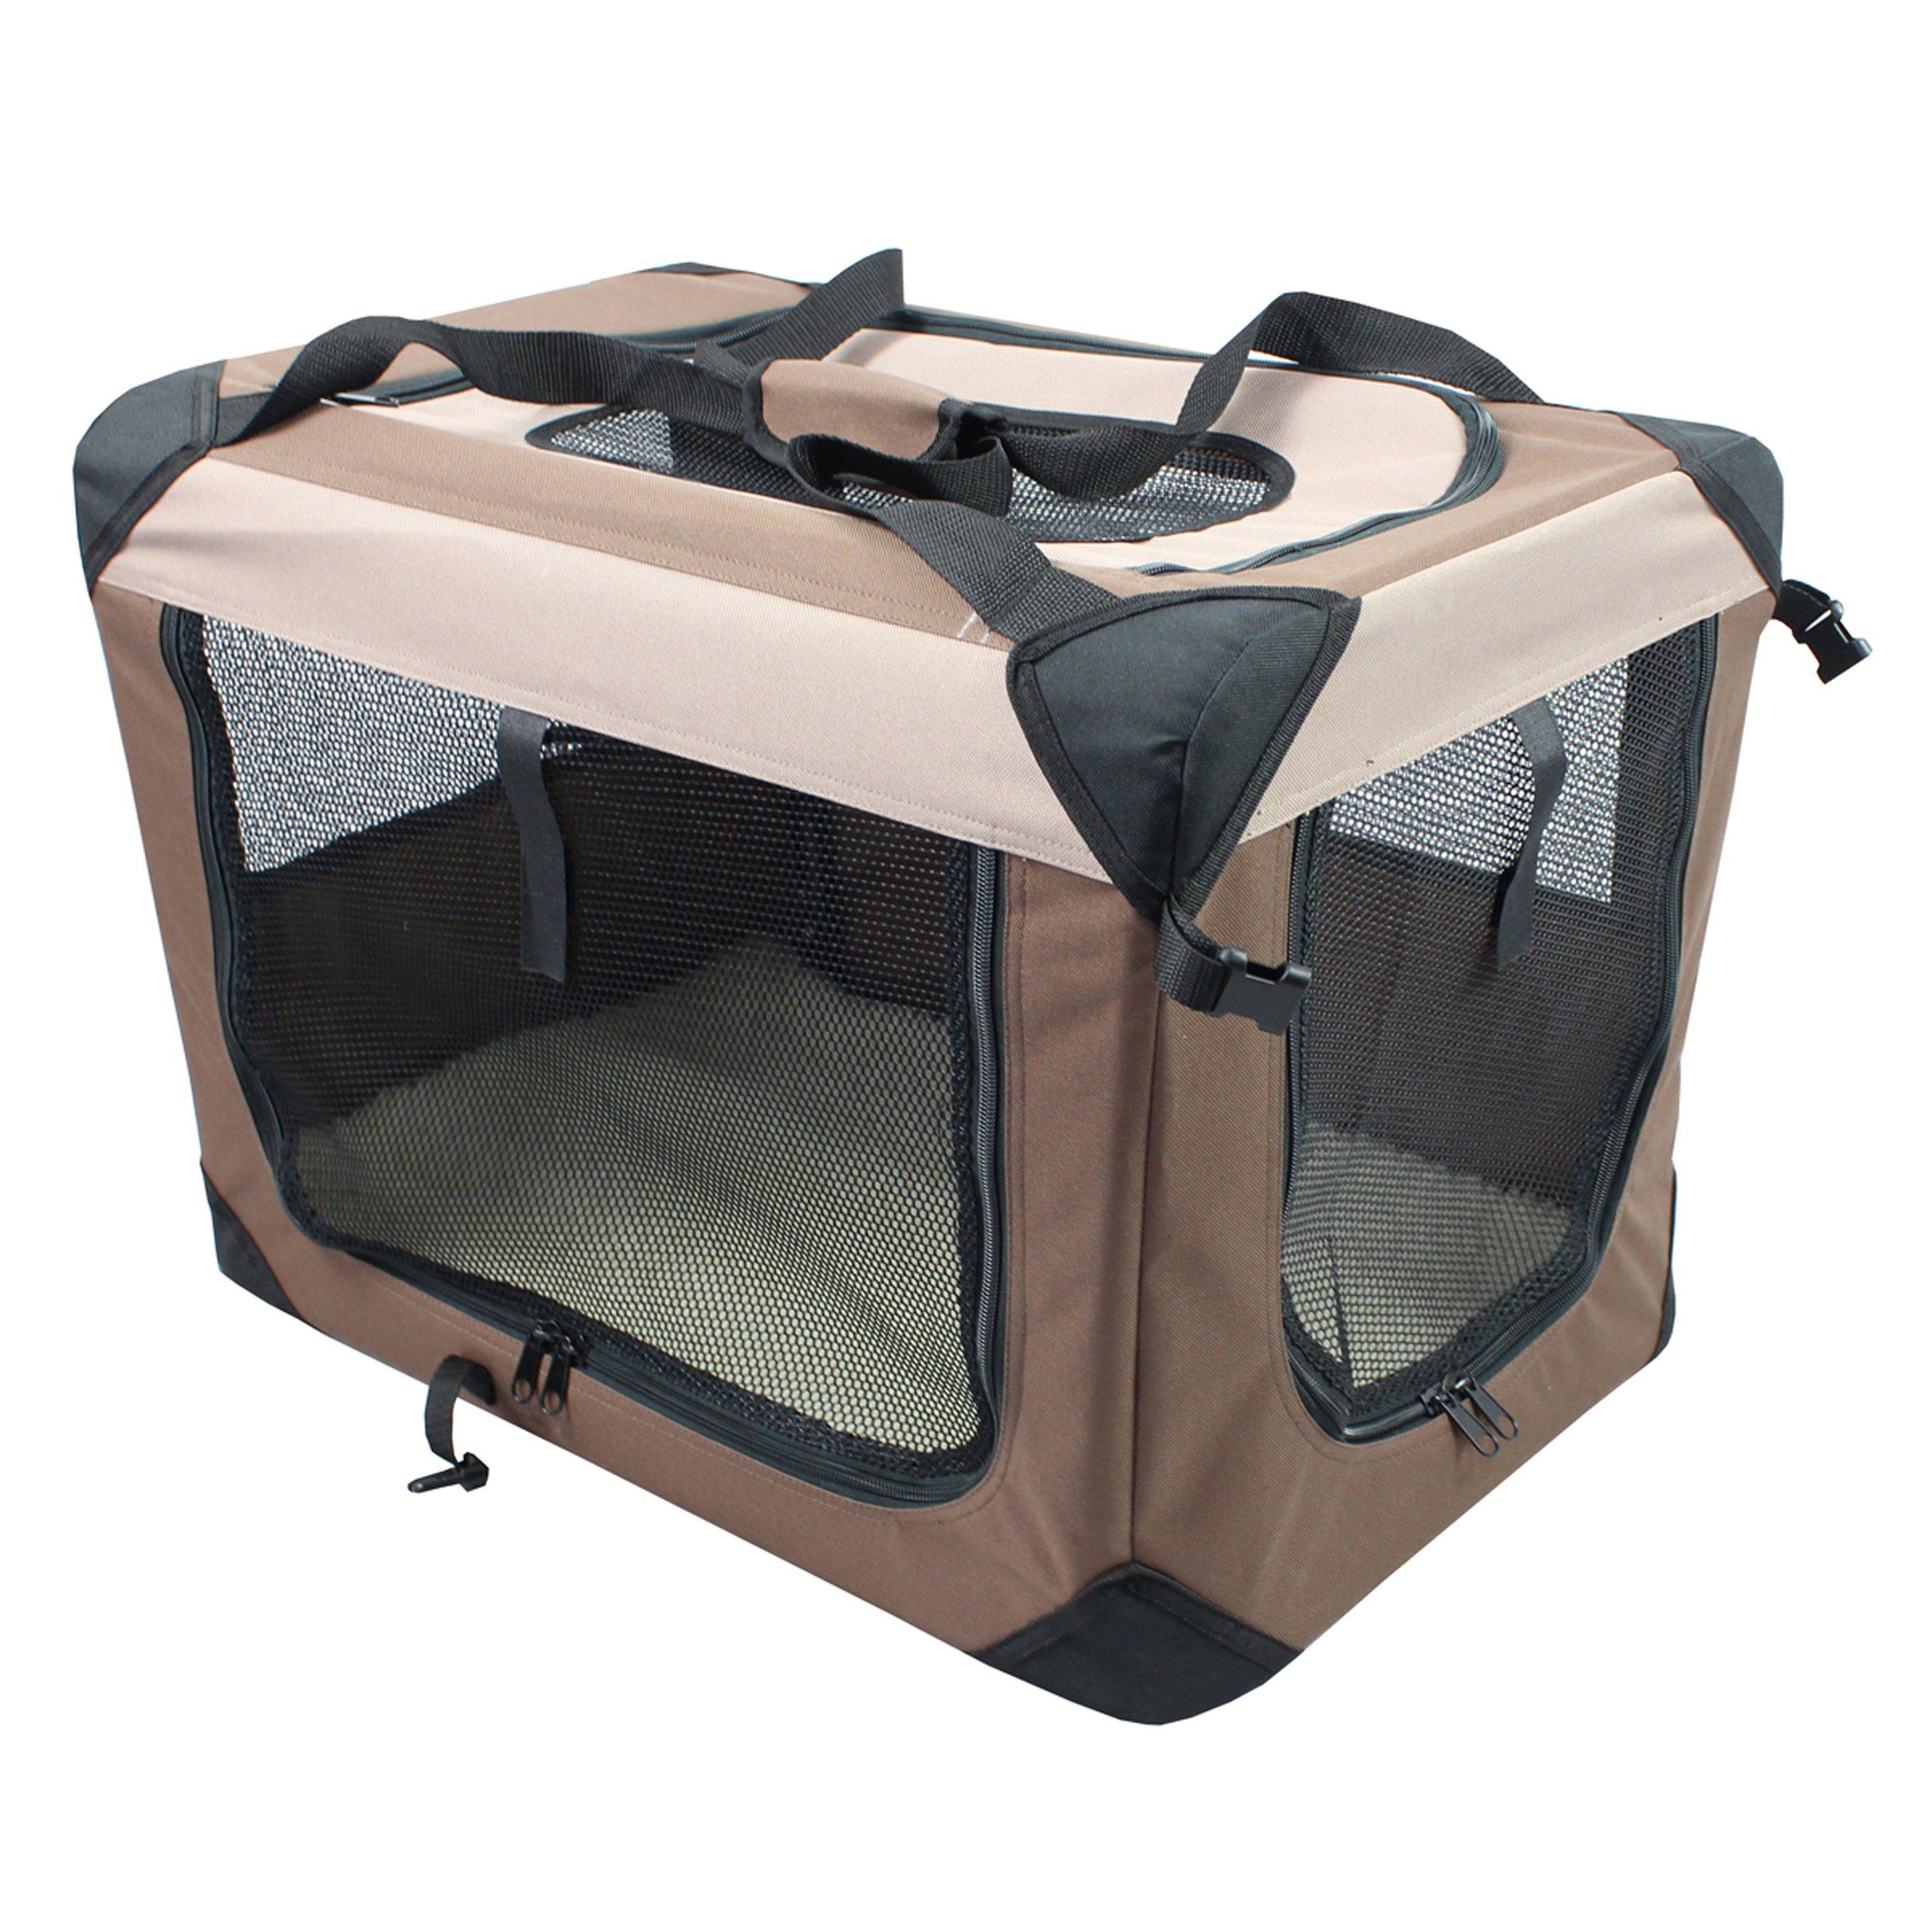 Iconic Pet Multipurpose Pet Soft Crate with Fleece Mat, Coffee/Khaki, Small